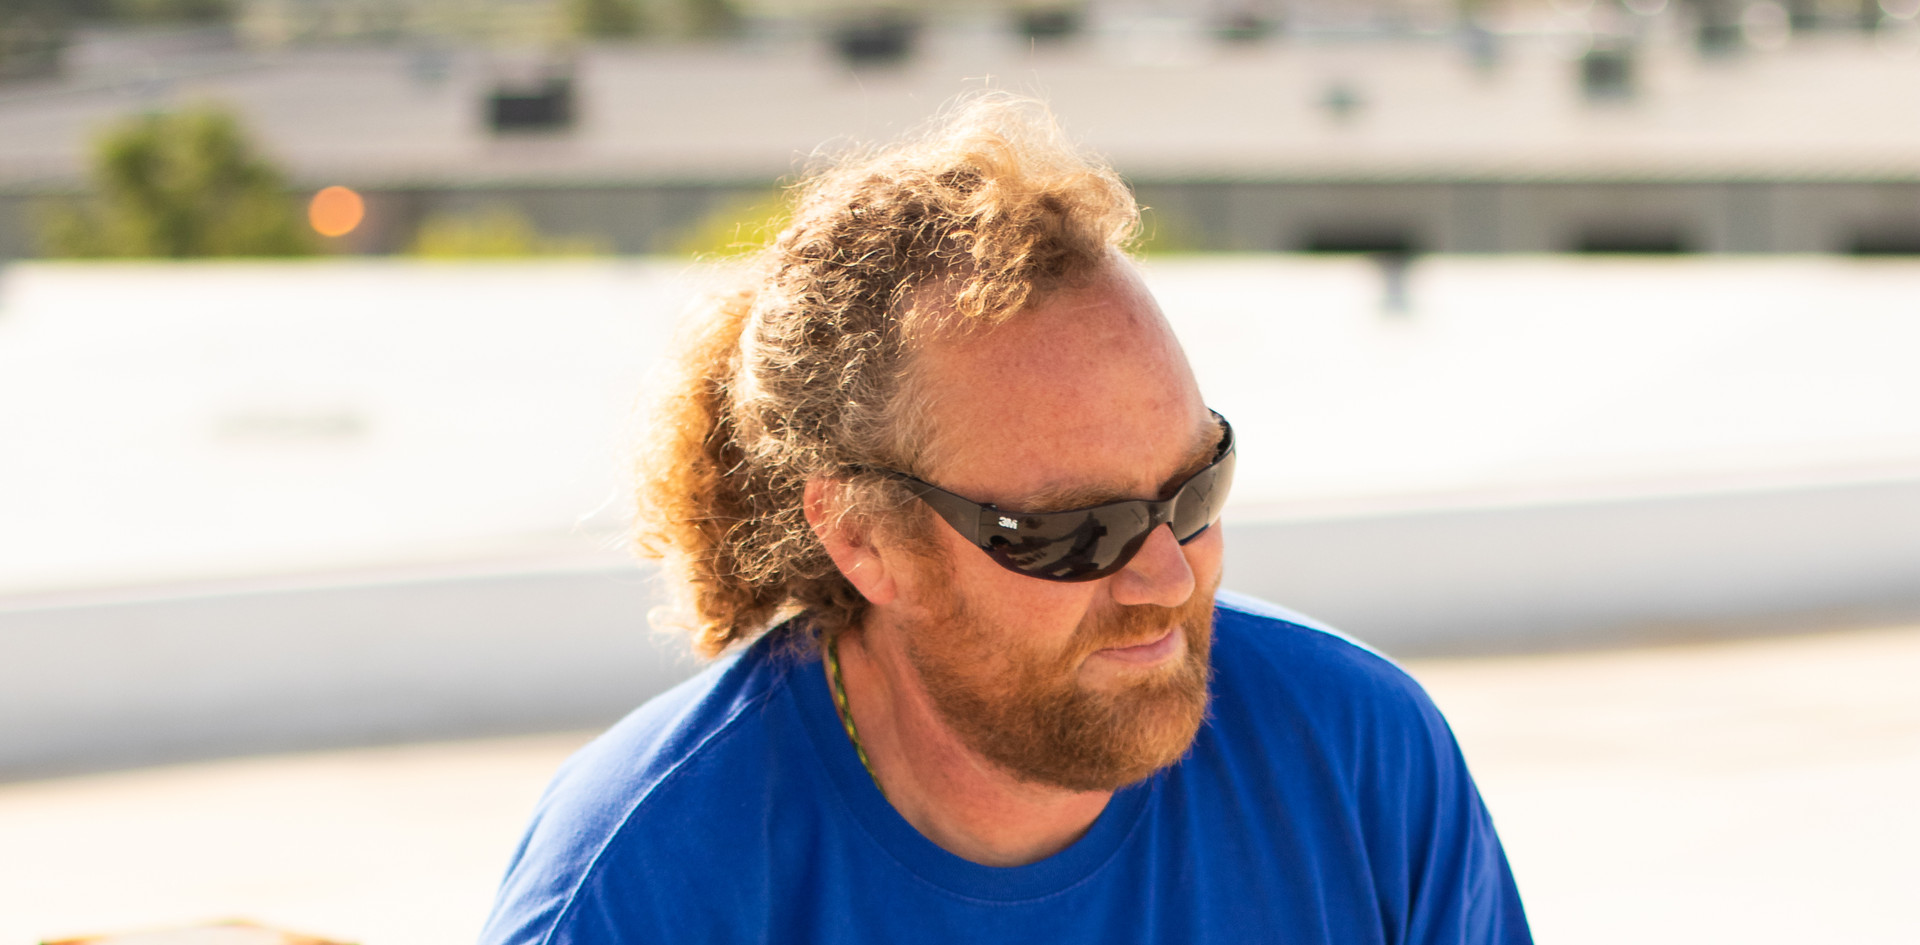 Brandon-Hopkins-Roofing-Crew63.jpg